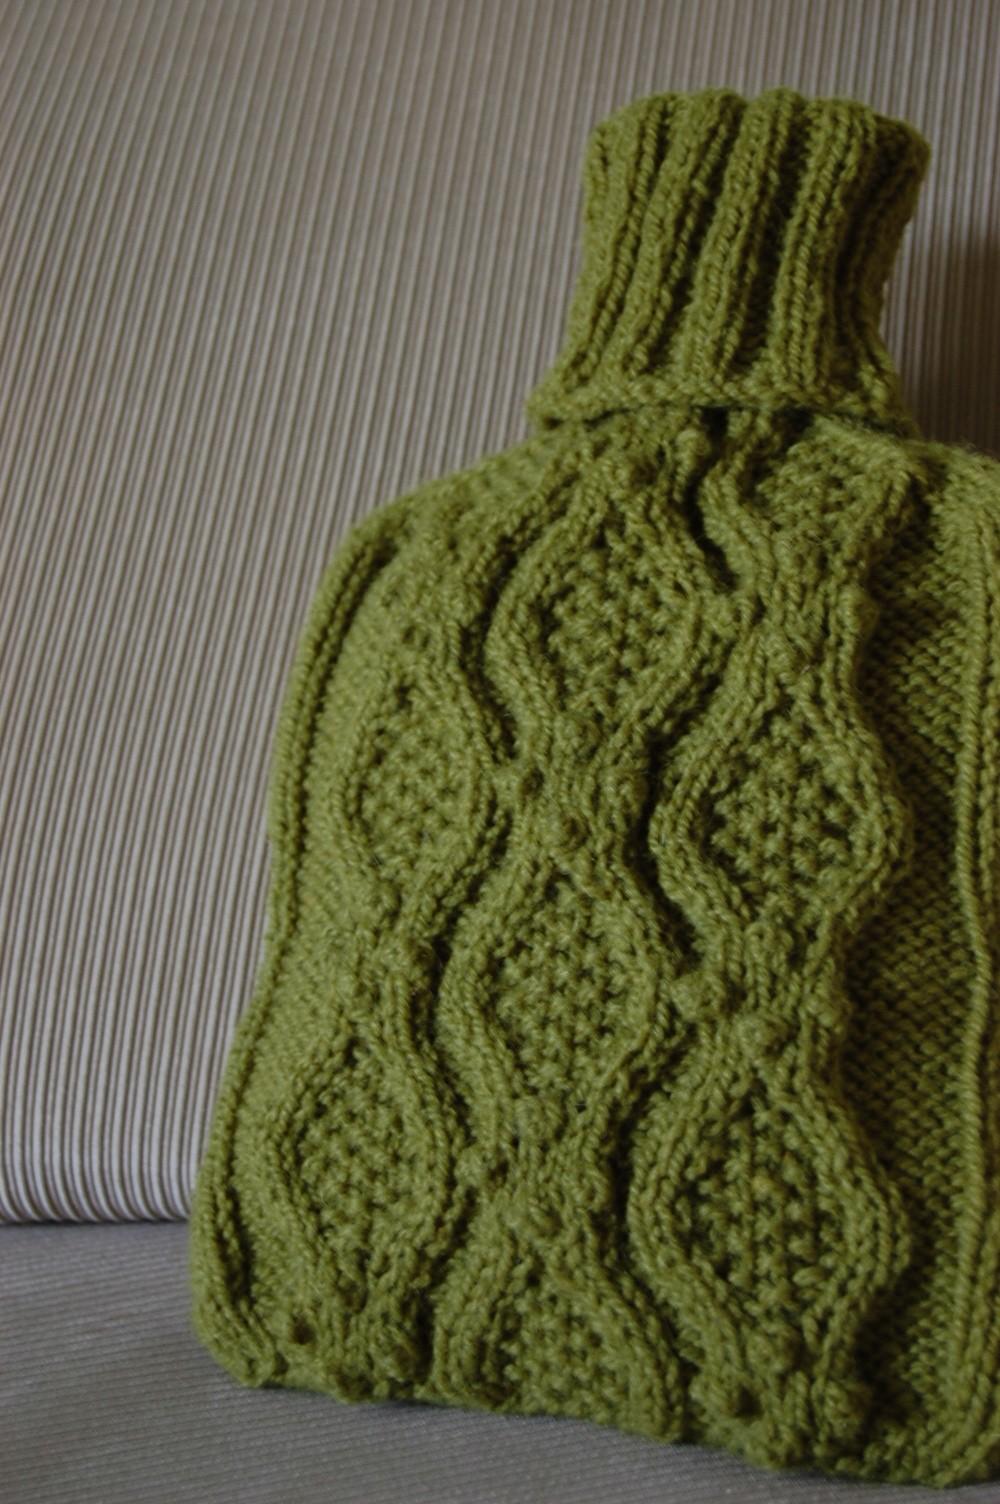 Knitting Pattern For Hot Water Bottle Cozy : Haworth Hot Water Bottle Cozy   Splendid Sparrow Handmade ...